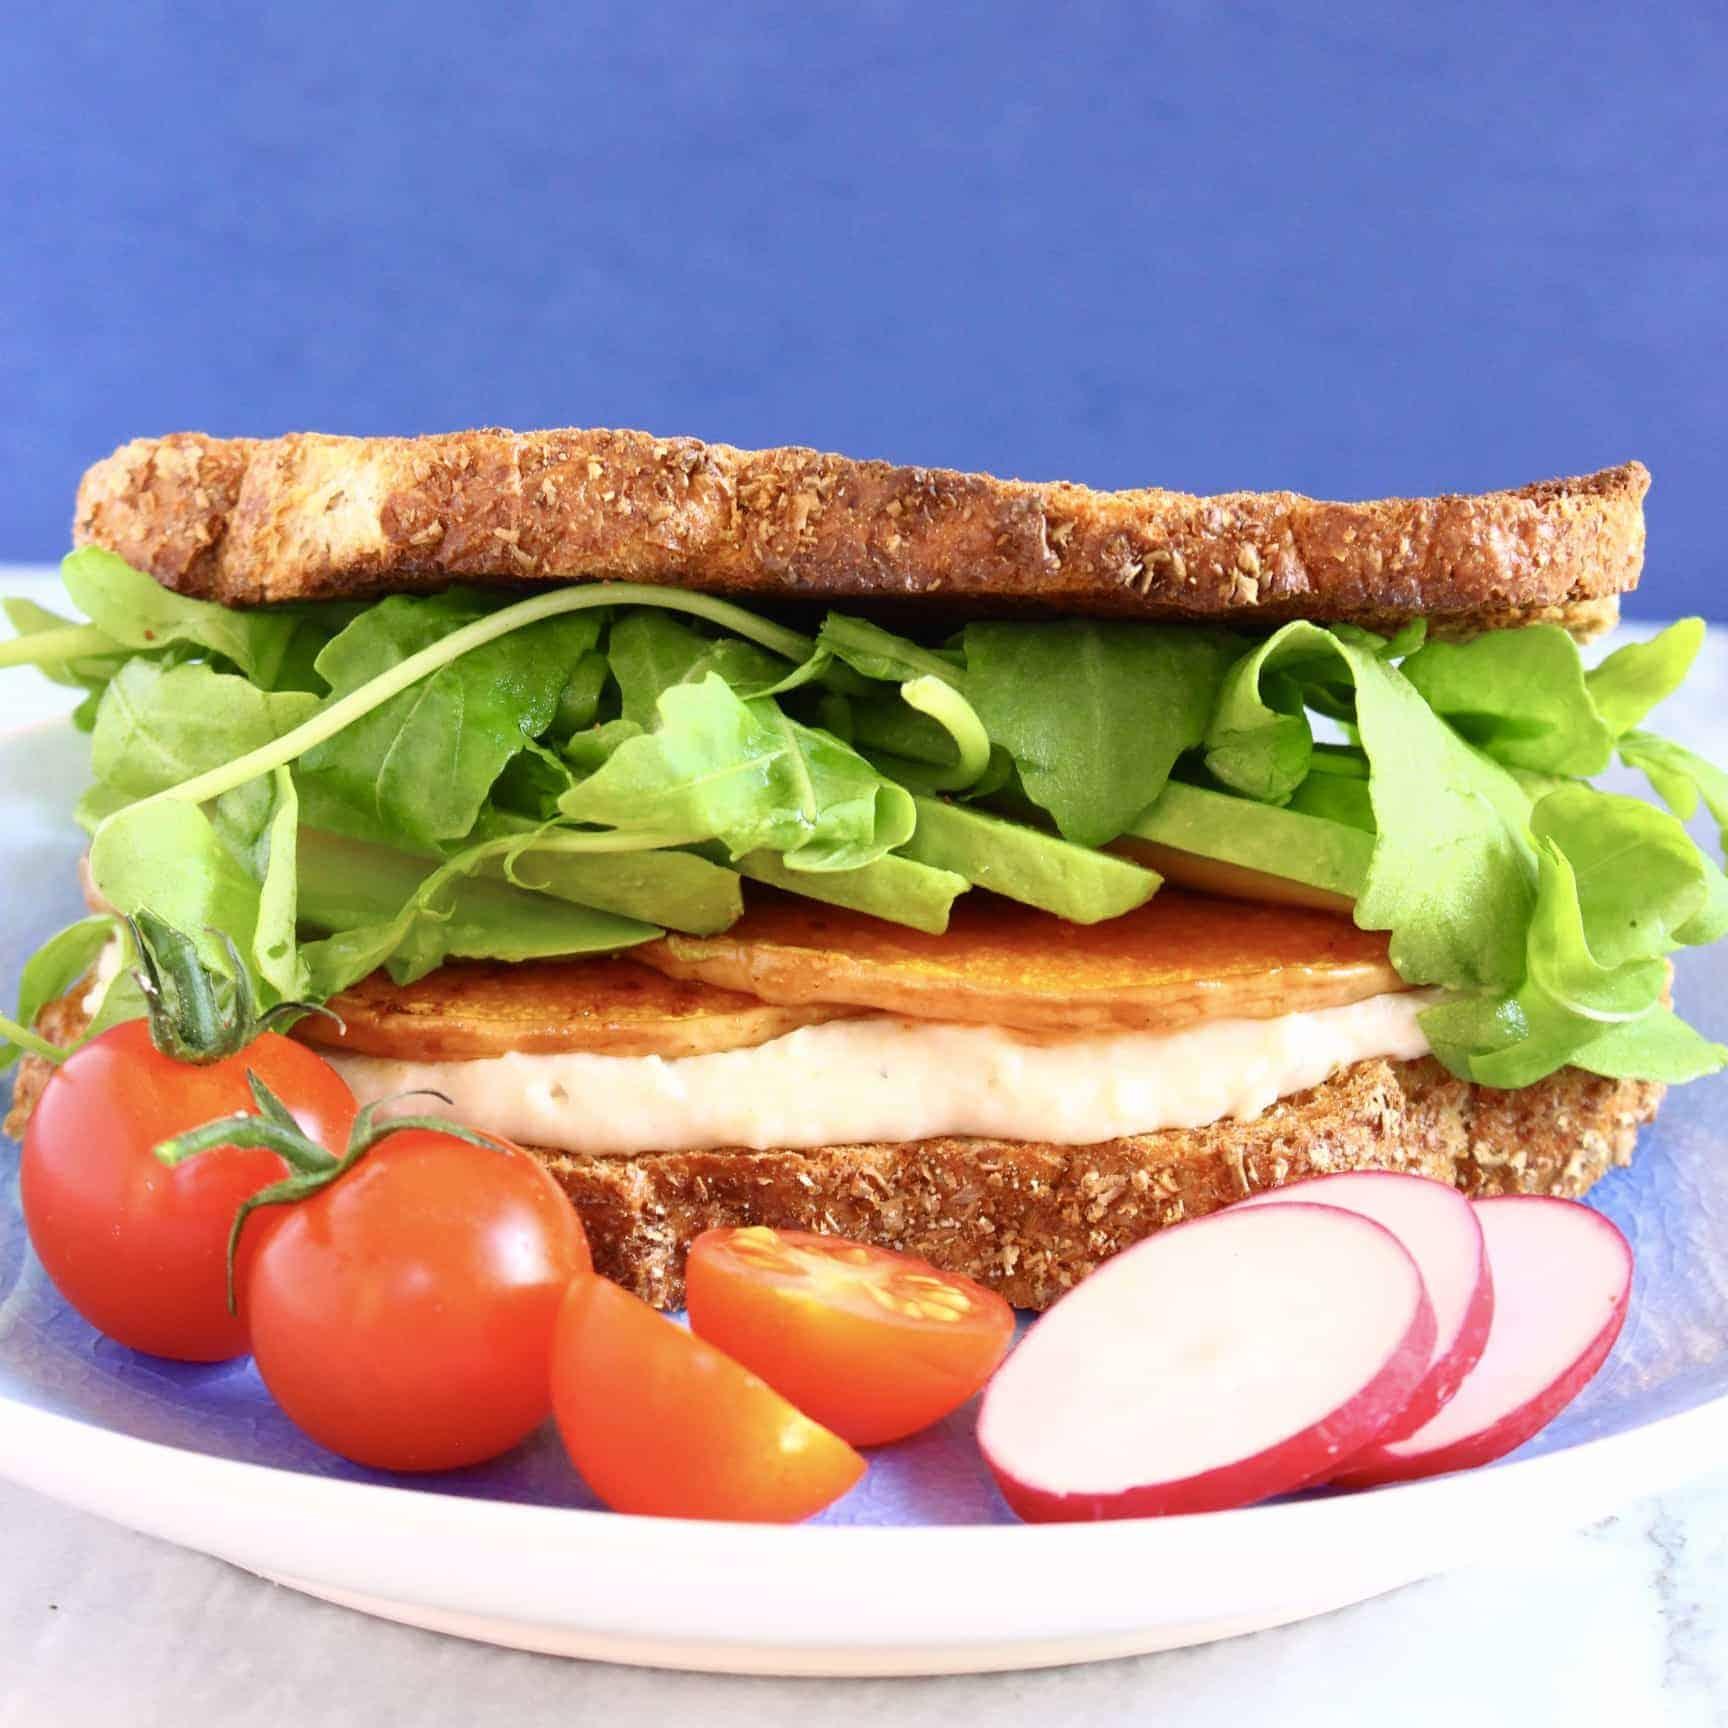 Vegan Hummus Toasted Sandwich (GF)